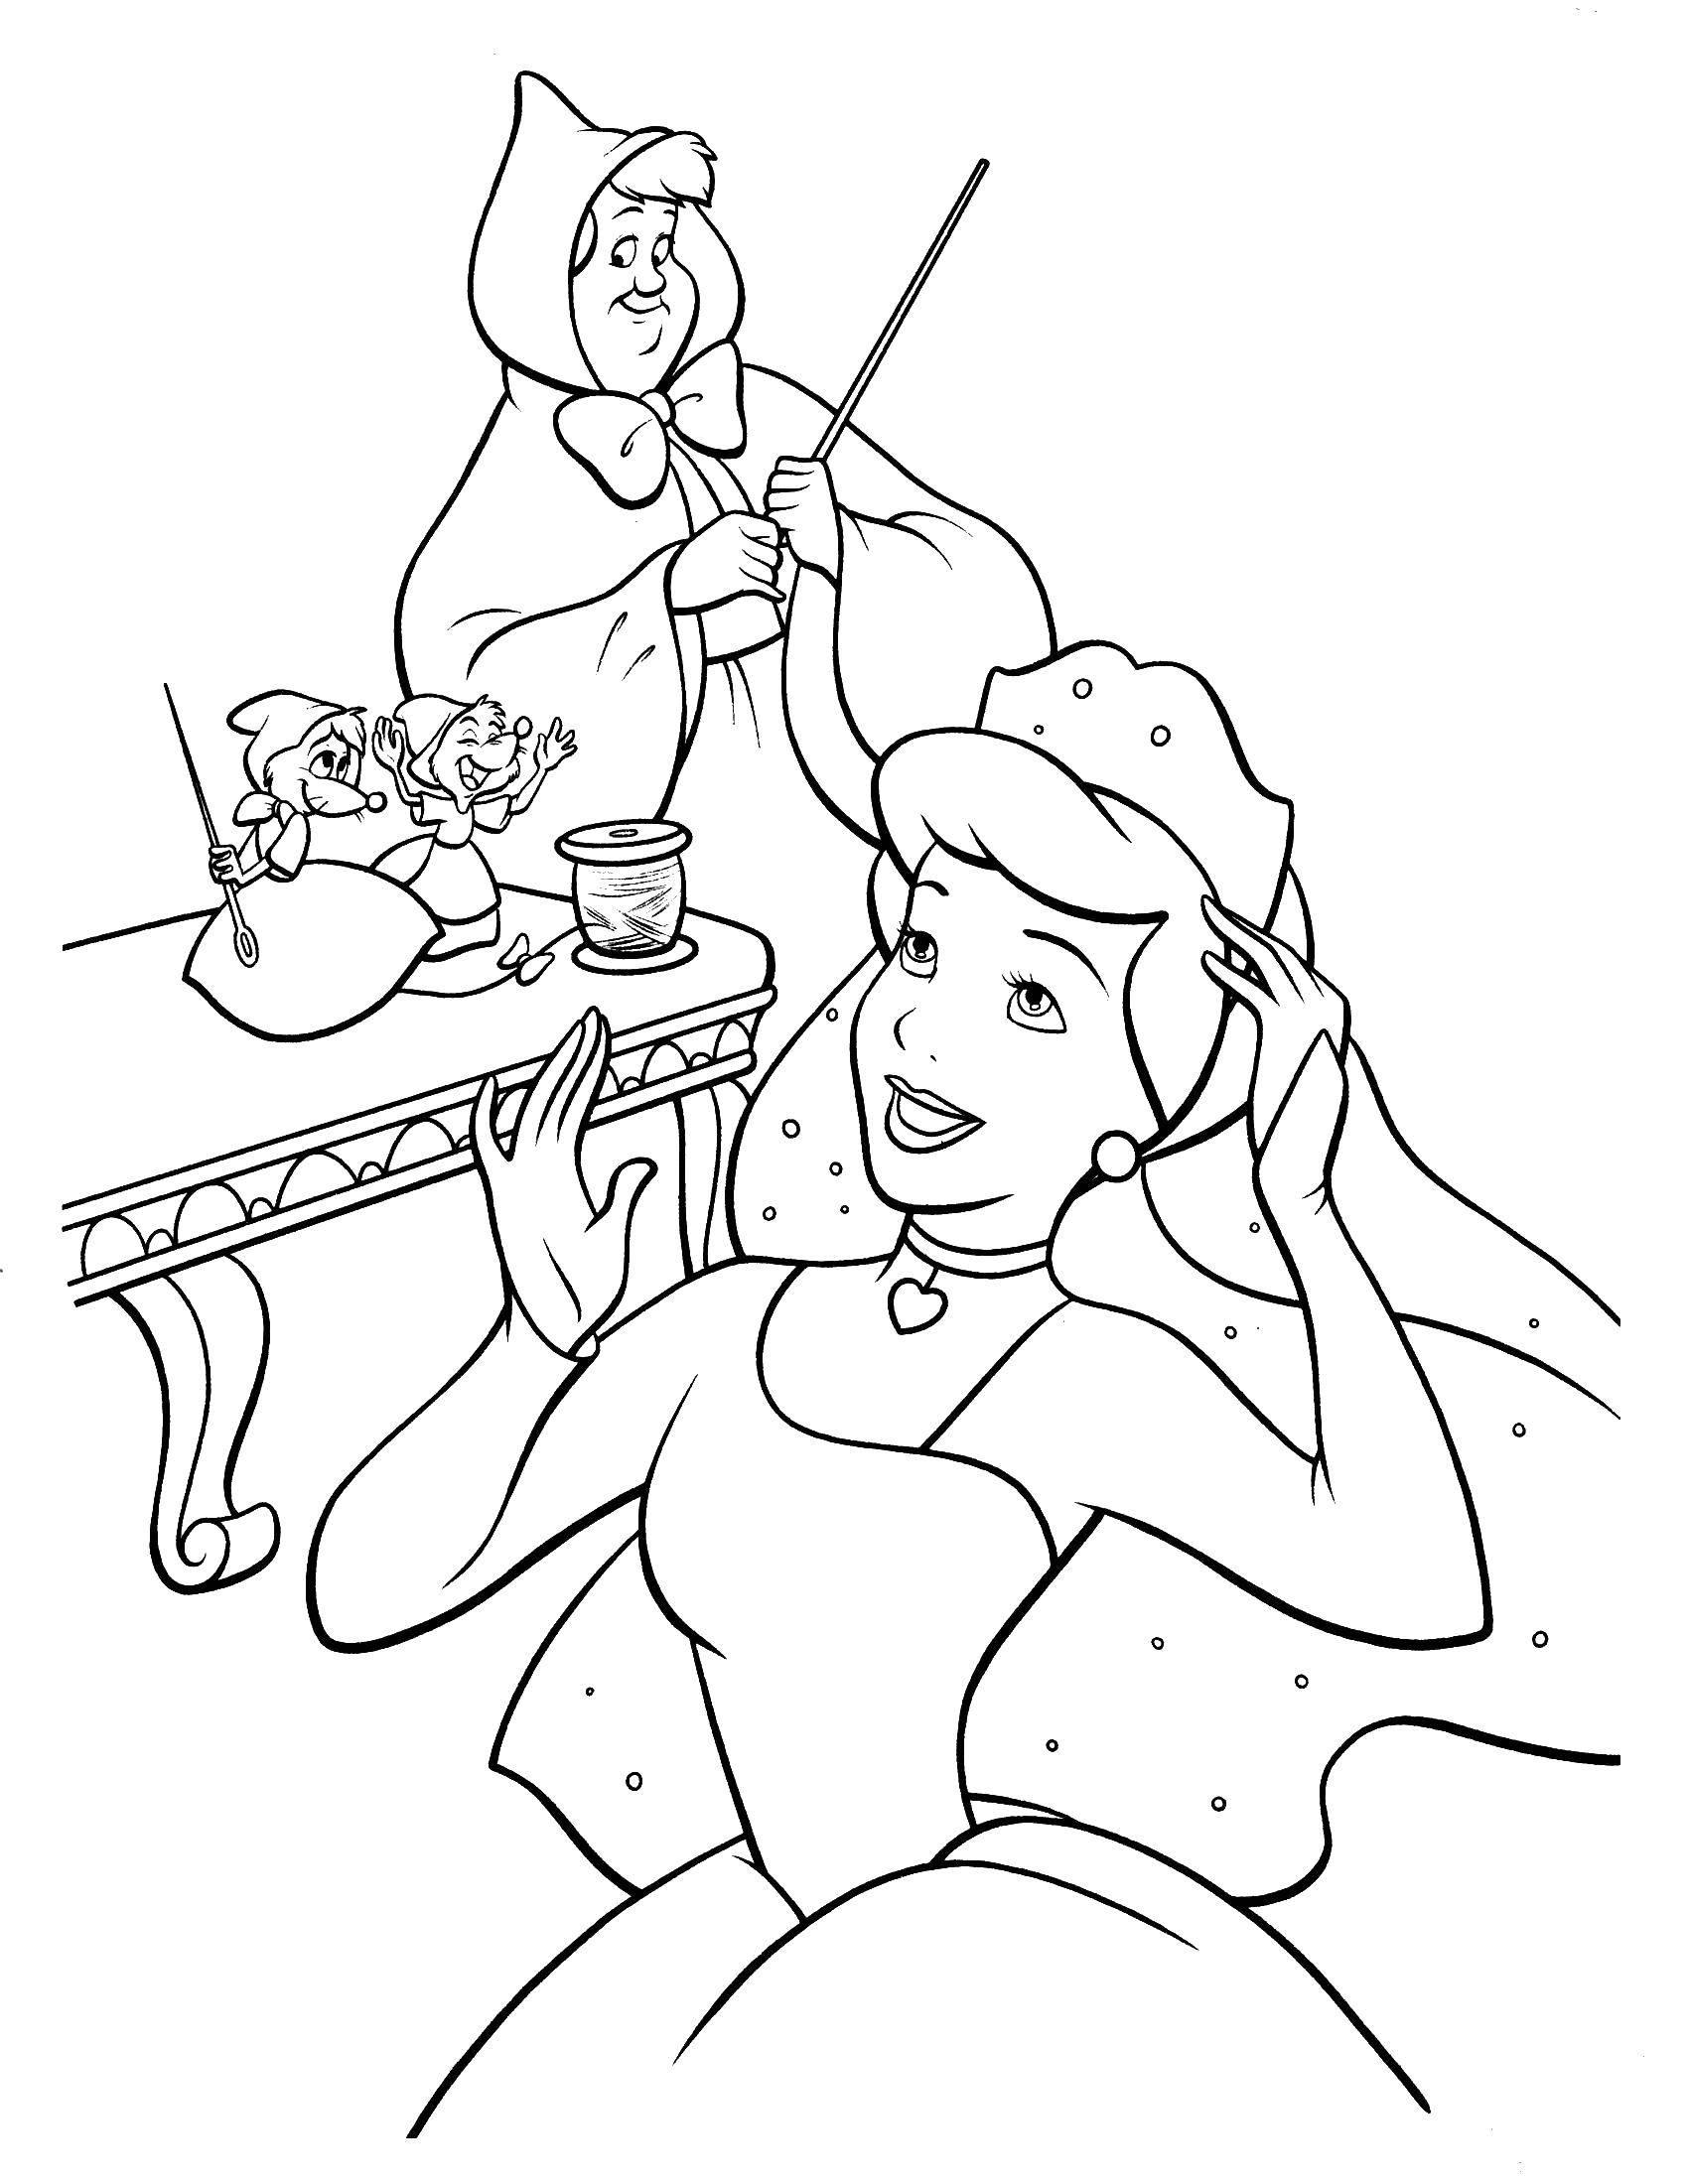 Coloring sheet Cinderella and the Prince Download fish, corals, algae.  Print ,fish,